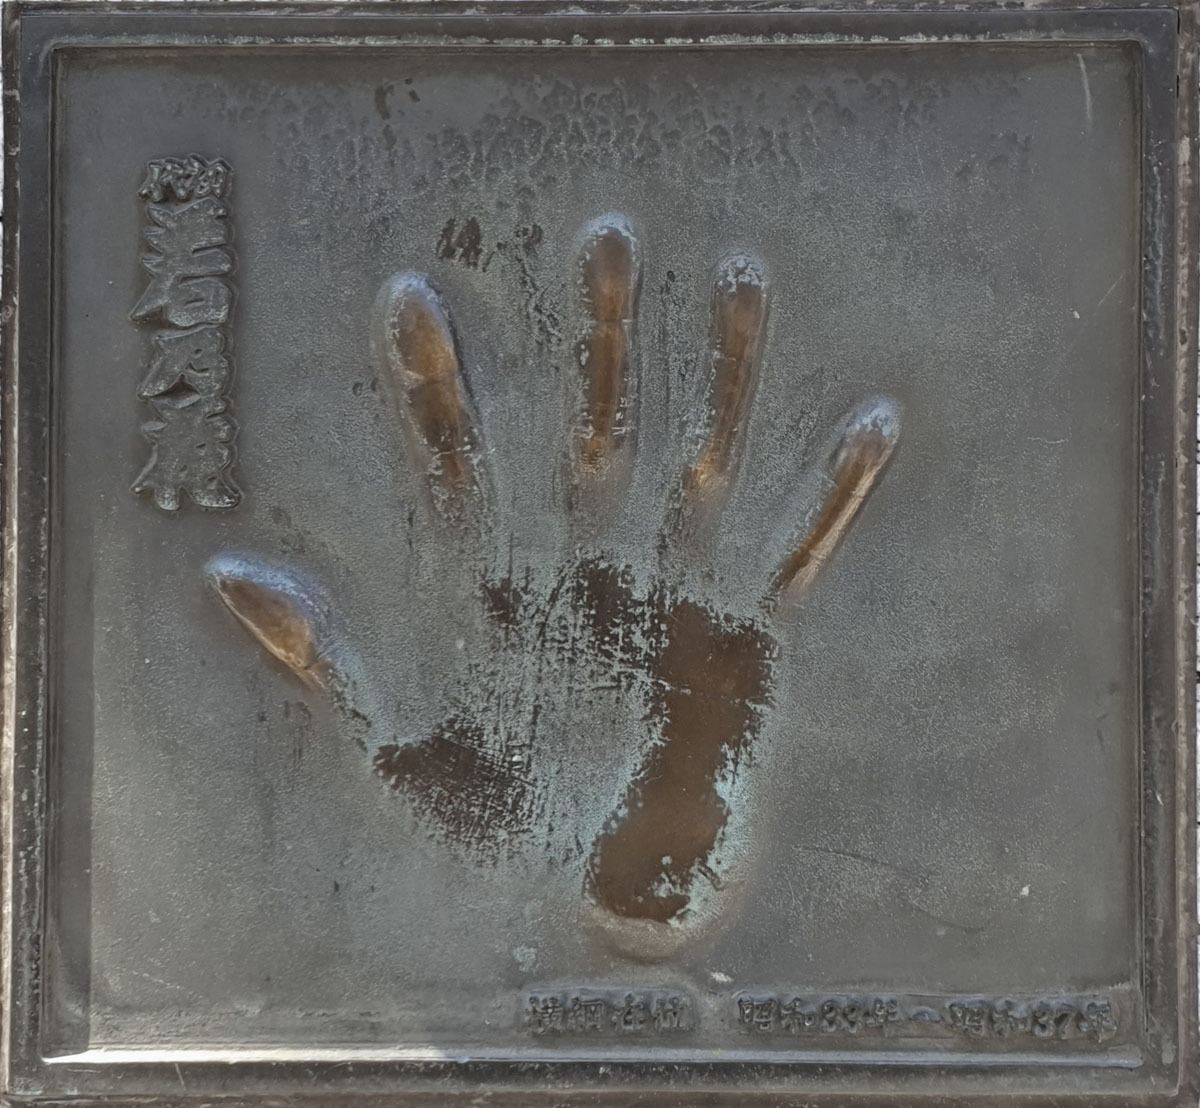 Sumo Wrestler Handprint